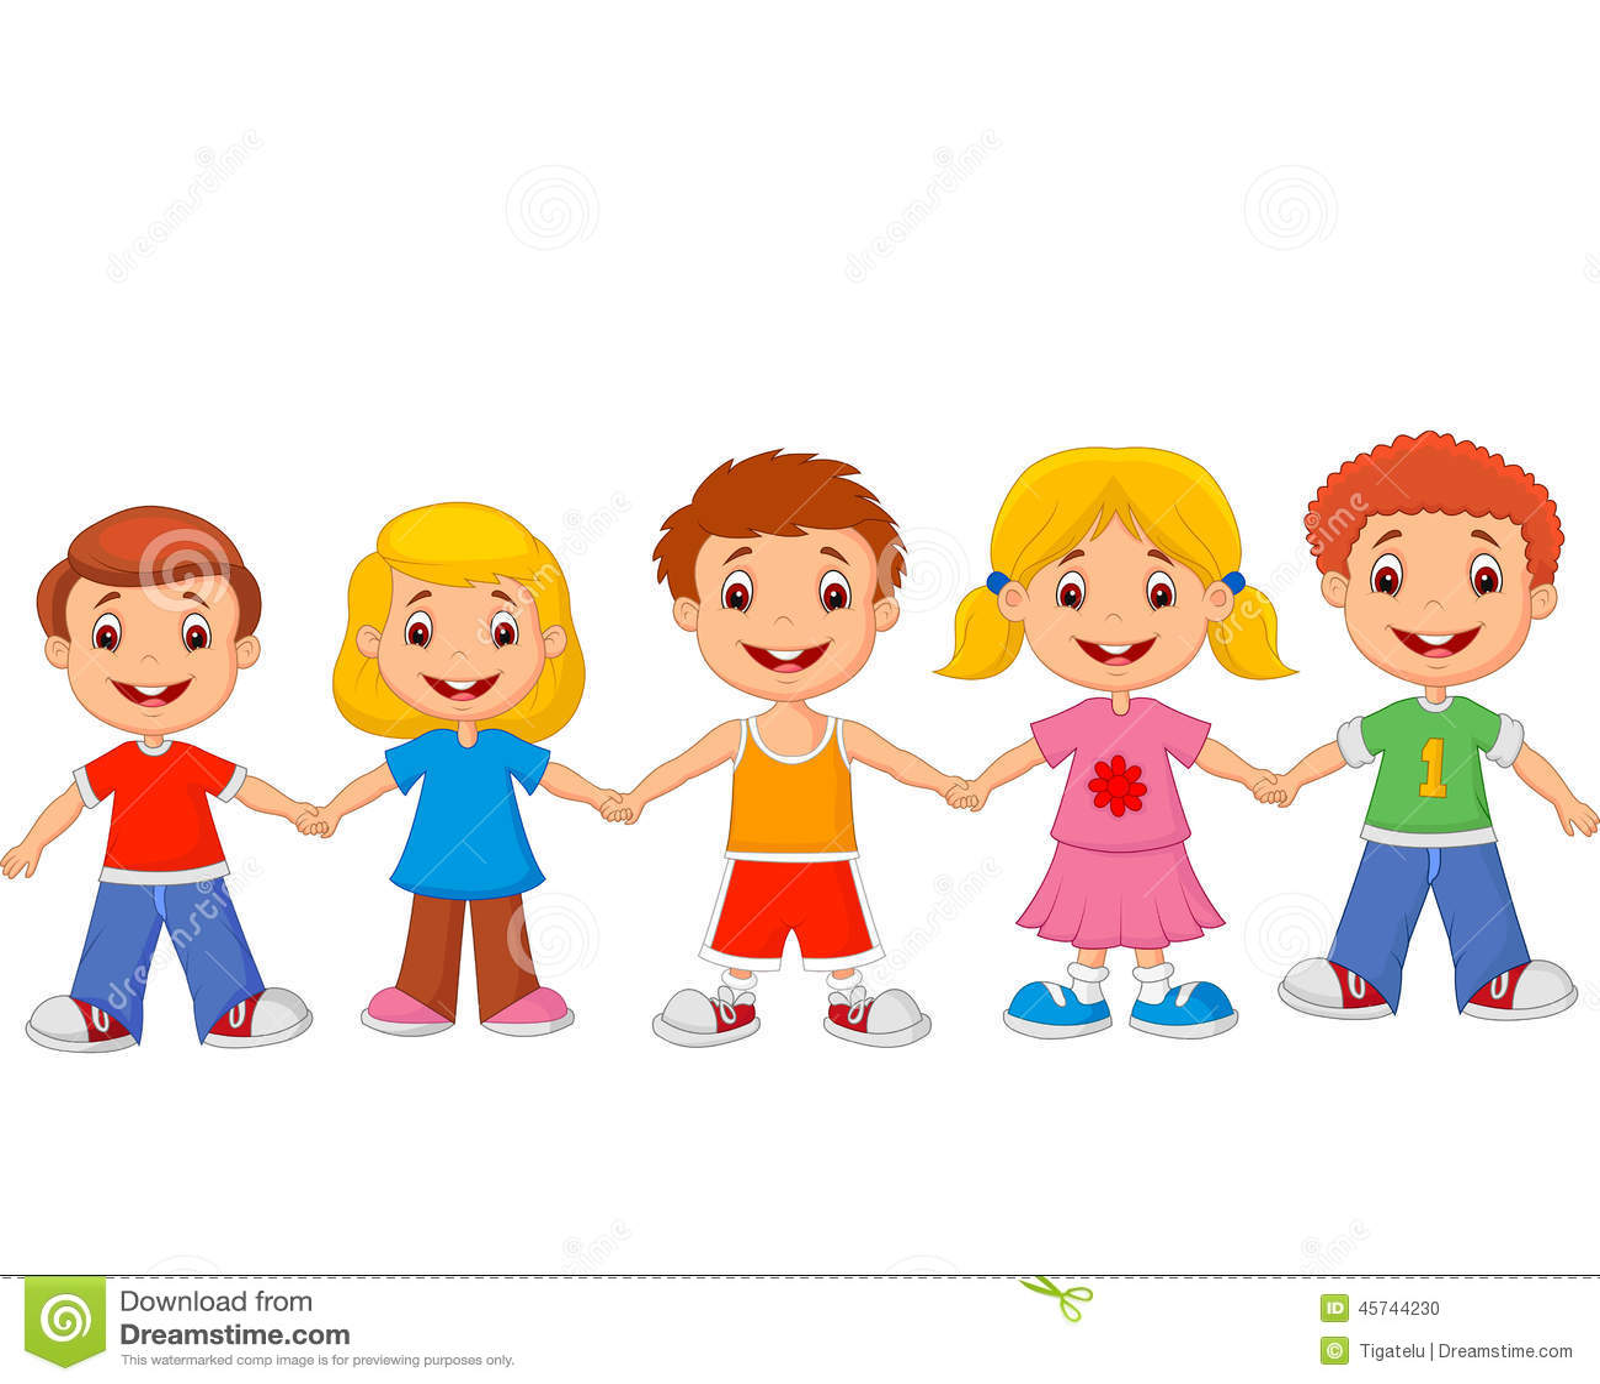 Free Barn Plans Little Children Cartoon Holding Hands Stock Vector Image